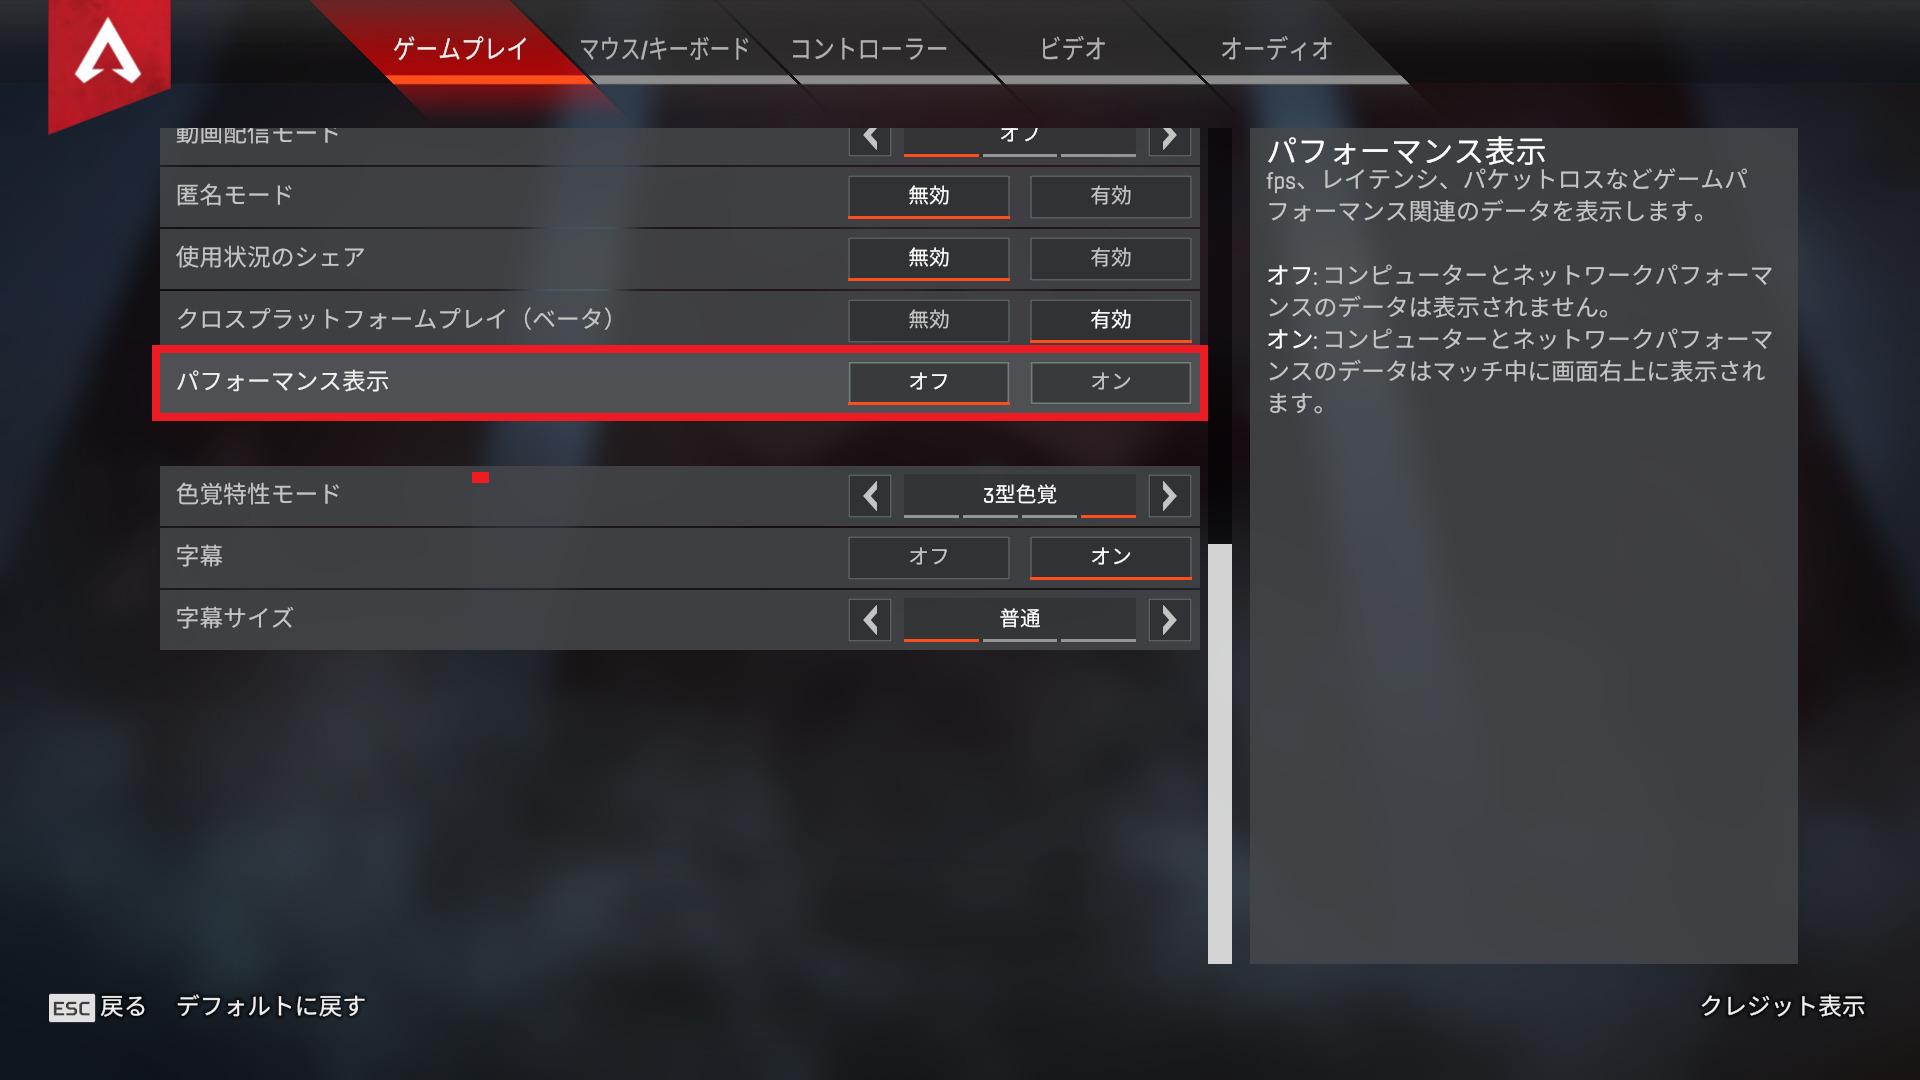 【APEX LEGENDS】Ping、FPS(フレームレート)を表示したい!パフォーマン表示の設定方法